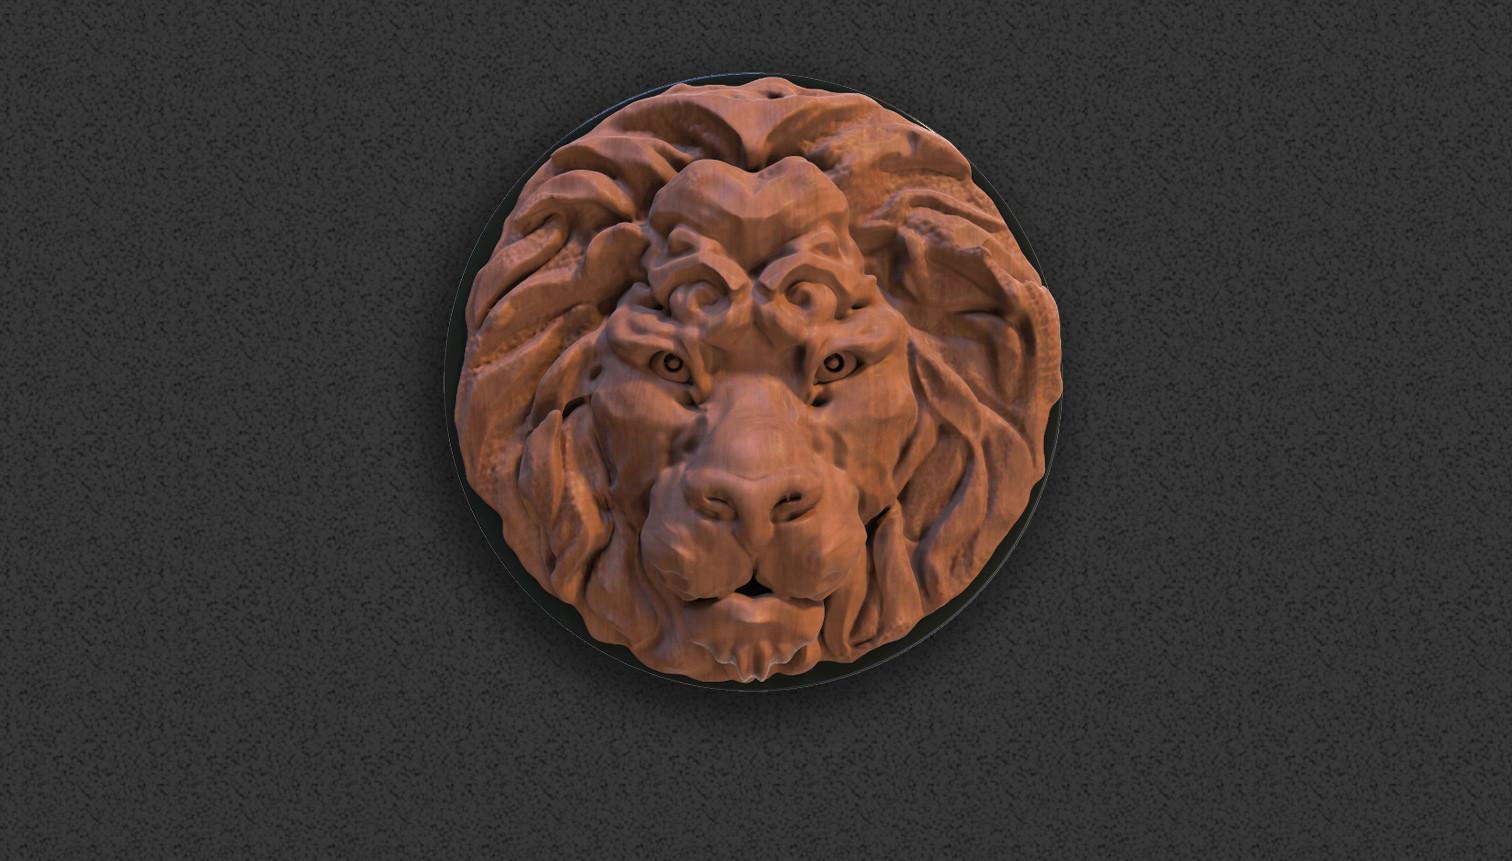 Konstantin gudym leon 002